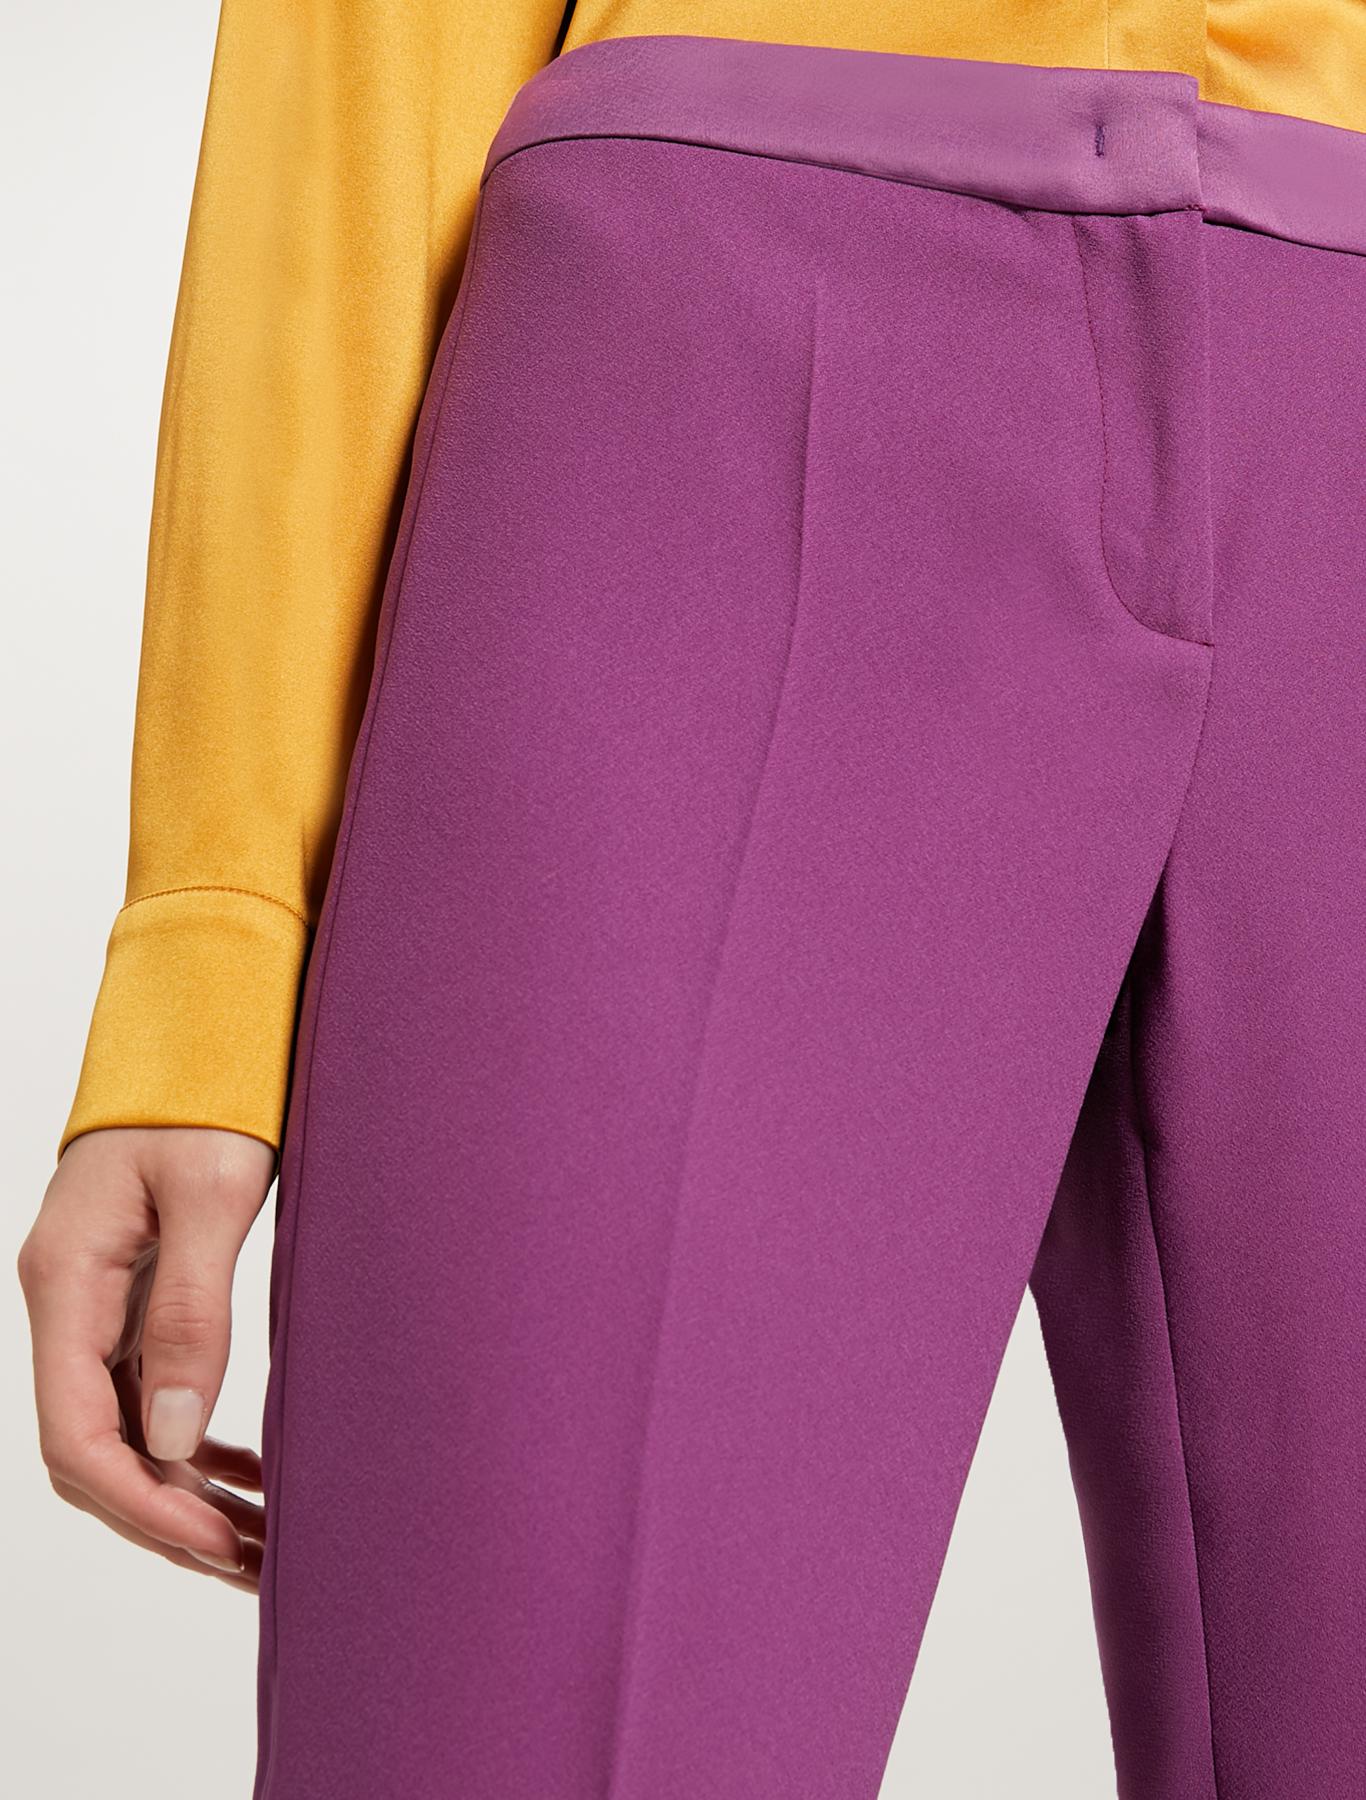 Slim fit envers satin trousers - purple - pennyblack